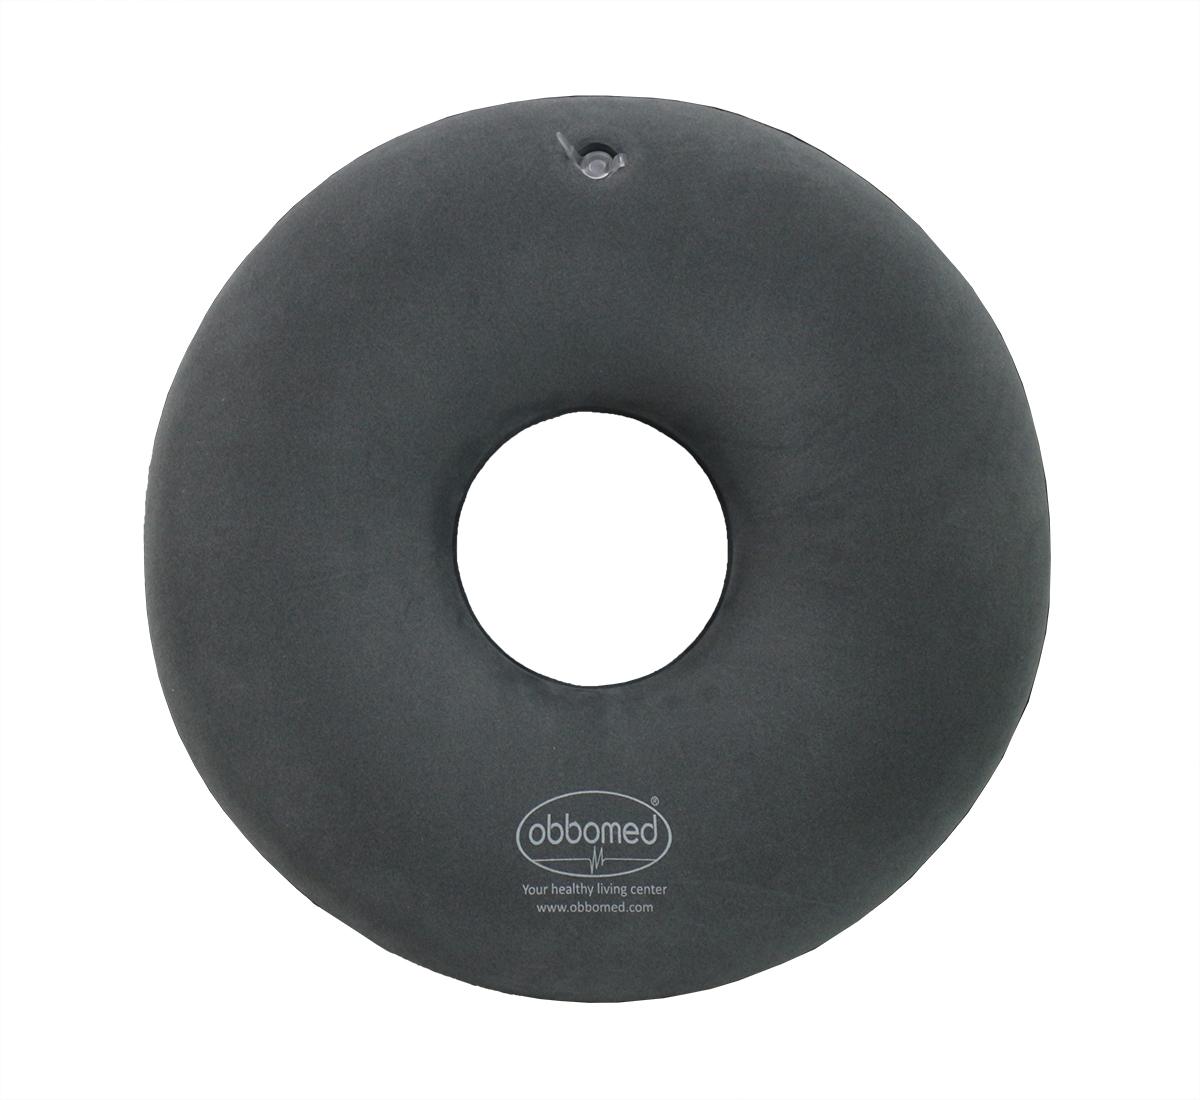 Sv 2500 Inflatable Donut Seat Pillow Cushion Diameter